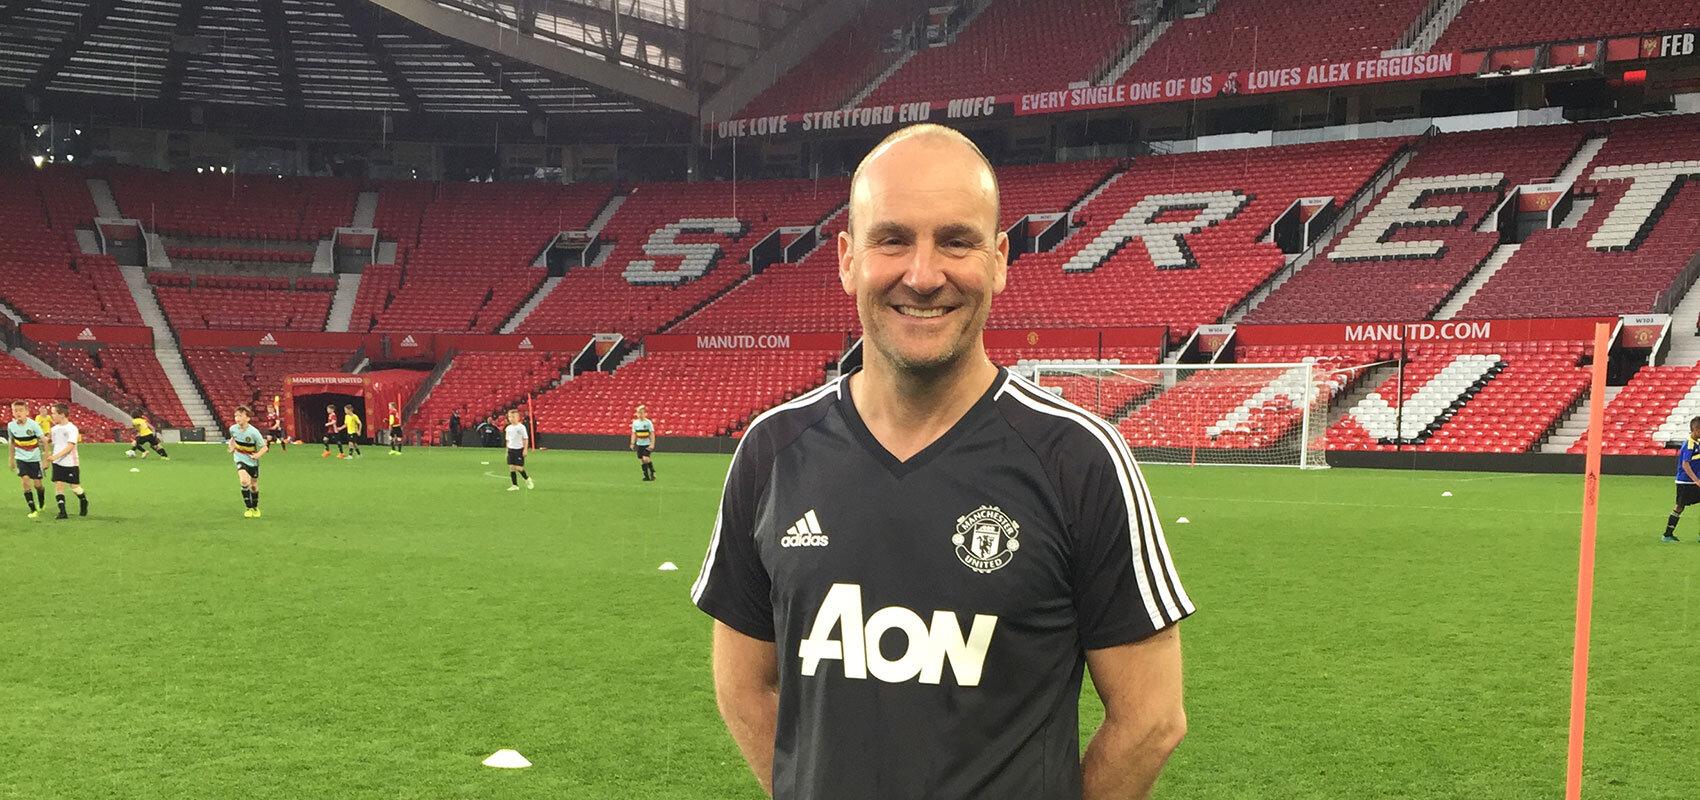 Manchester United Academy Coach Tom Statham S Coaching Philosophy Goplay International Sports Tours